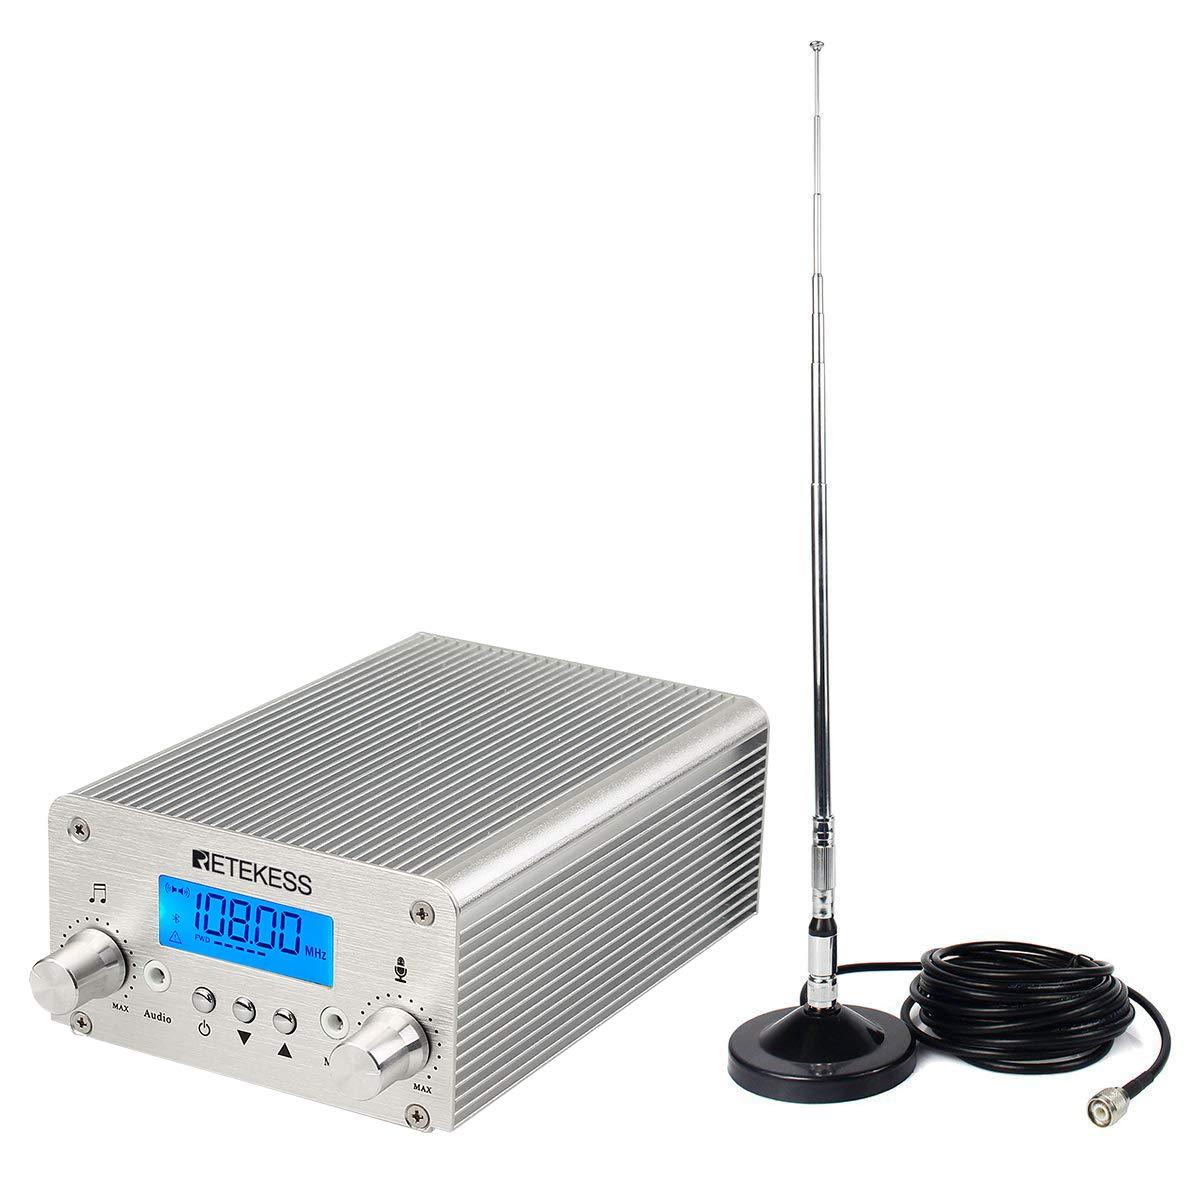 Retekess TR502 15W FM Transmitter Long Range Wireless Broadcast Stereo  Station 8 Level RF Power Adjustable Support AUX Input USB for Church(Silver)